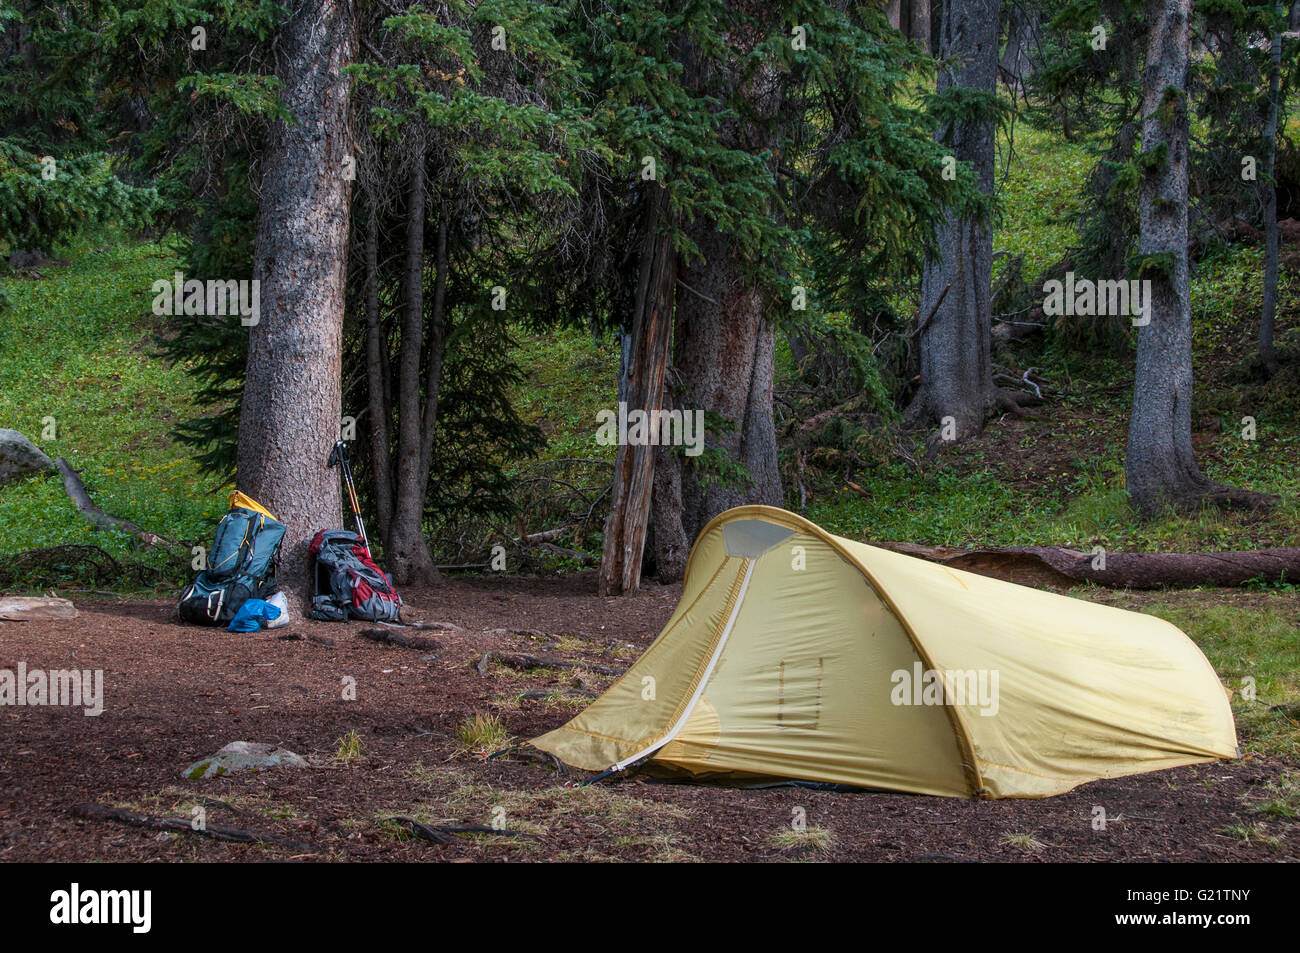 Campsite, Chicago Basin, Columbine Pass Trail, Weminuche Wilderness Area, San Juan National Forest, Colorado. - Stock Image